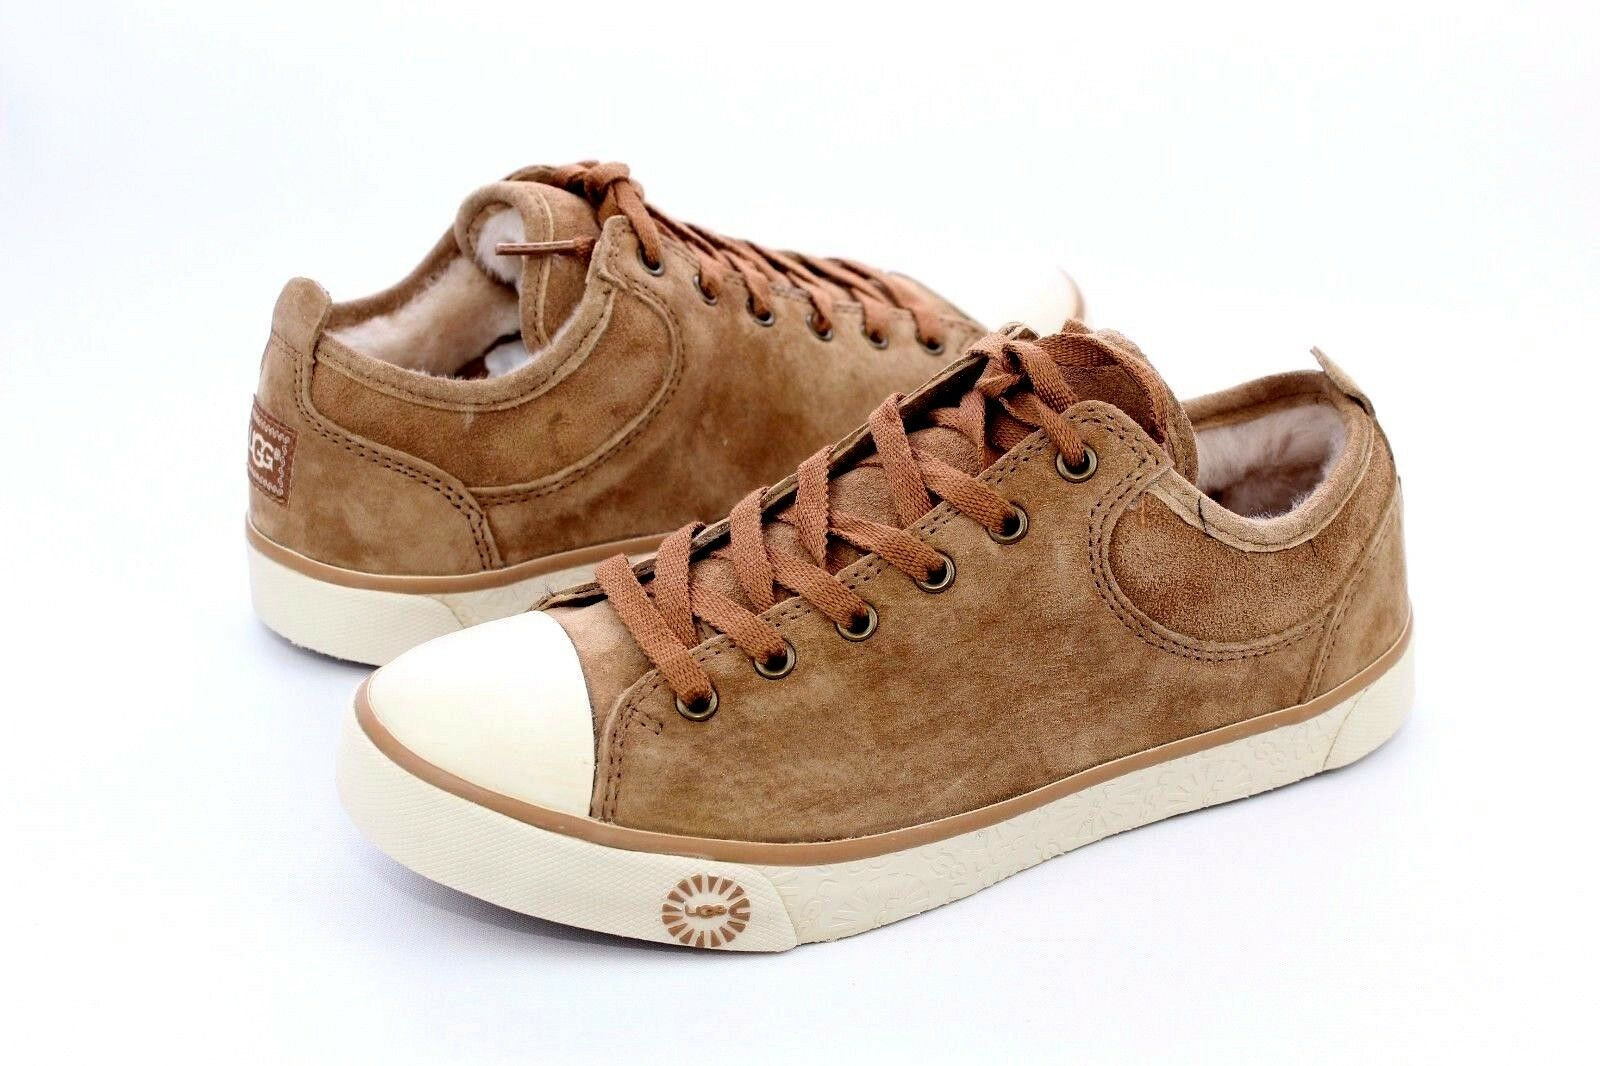 ugg australia women s evera chestnut sneakers 1888 6 ebay rh ebay com